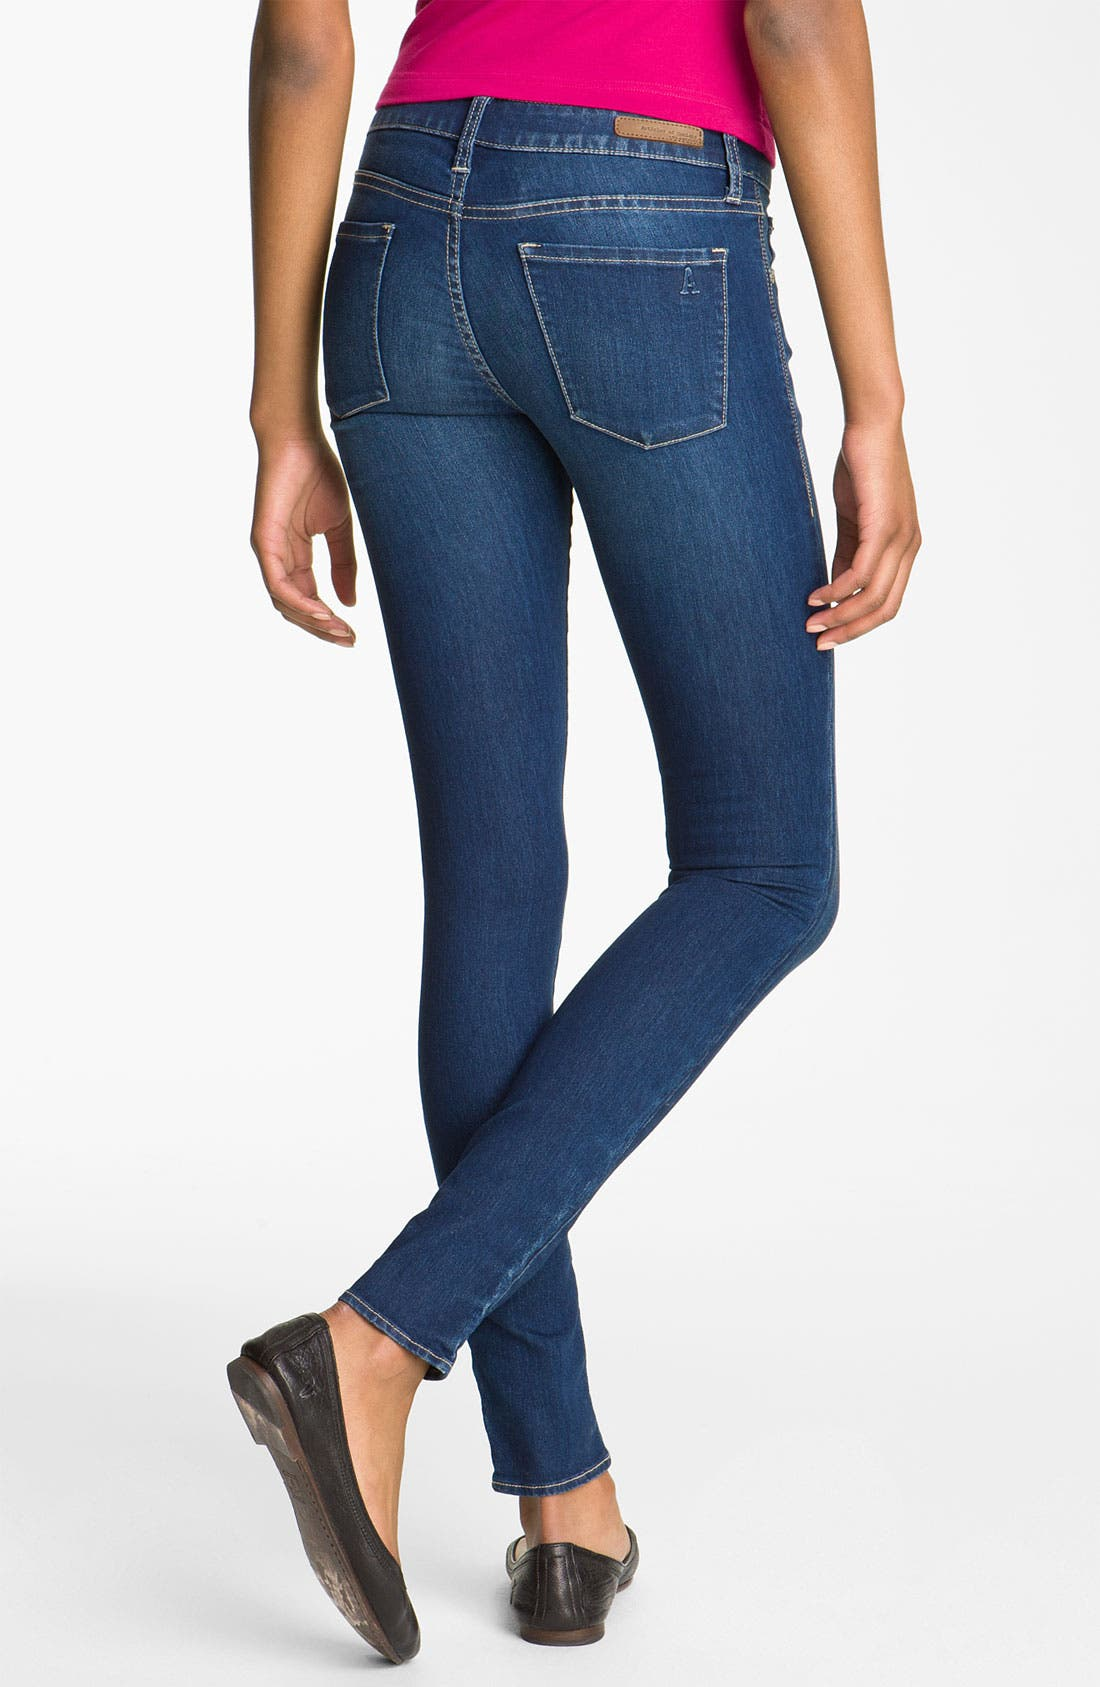 Alternate Image 1 Selected - Articles of Society 'Mya' Skinny Jeans (Juniors)